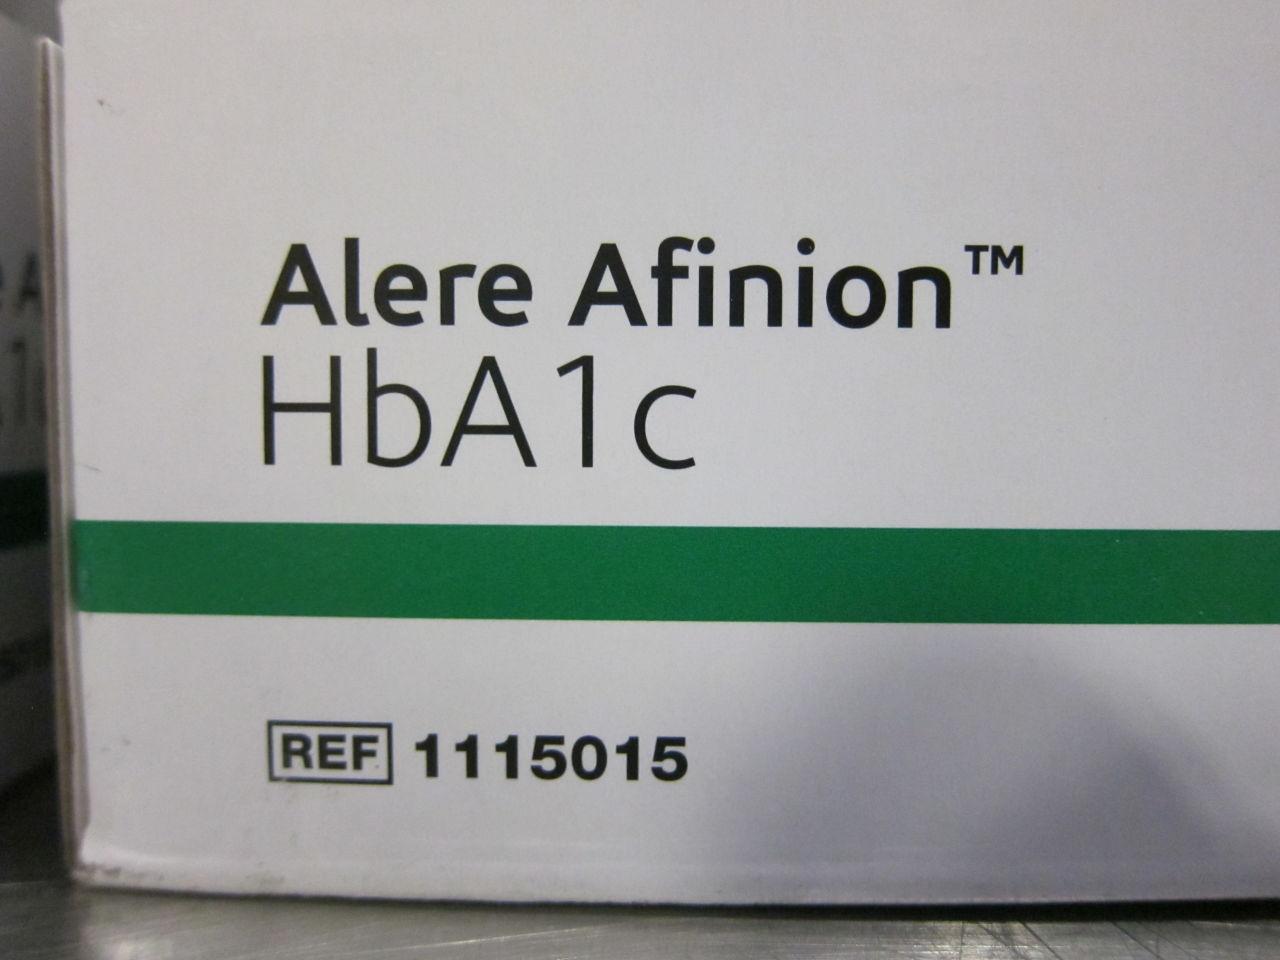 ALERE Afinion HbAlc Test Cartridges